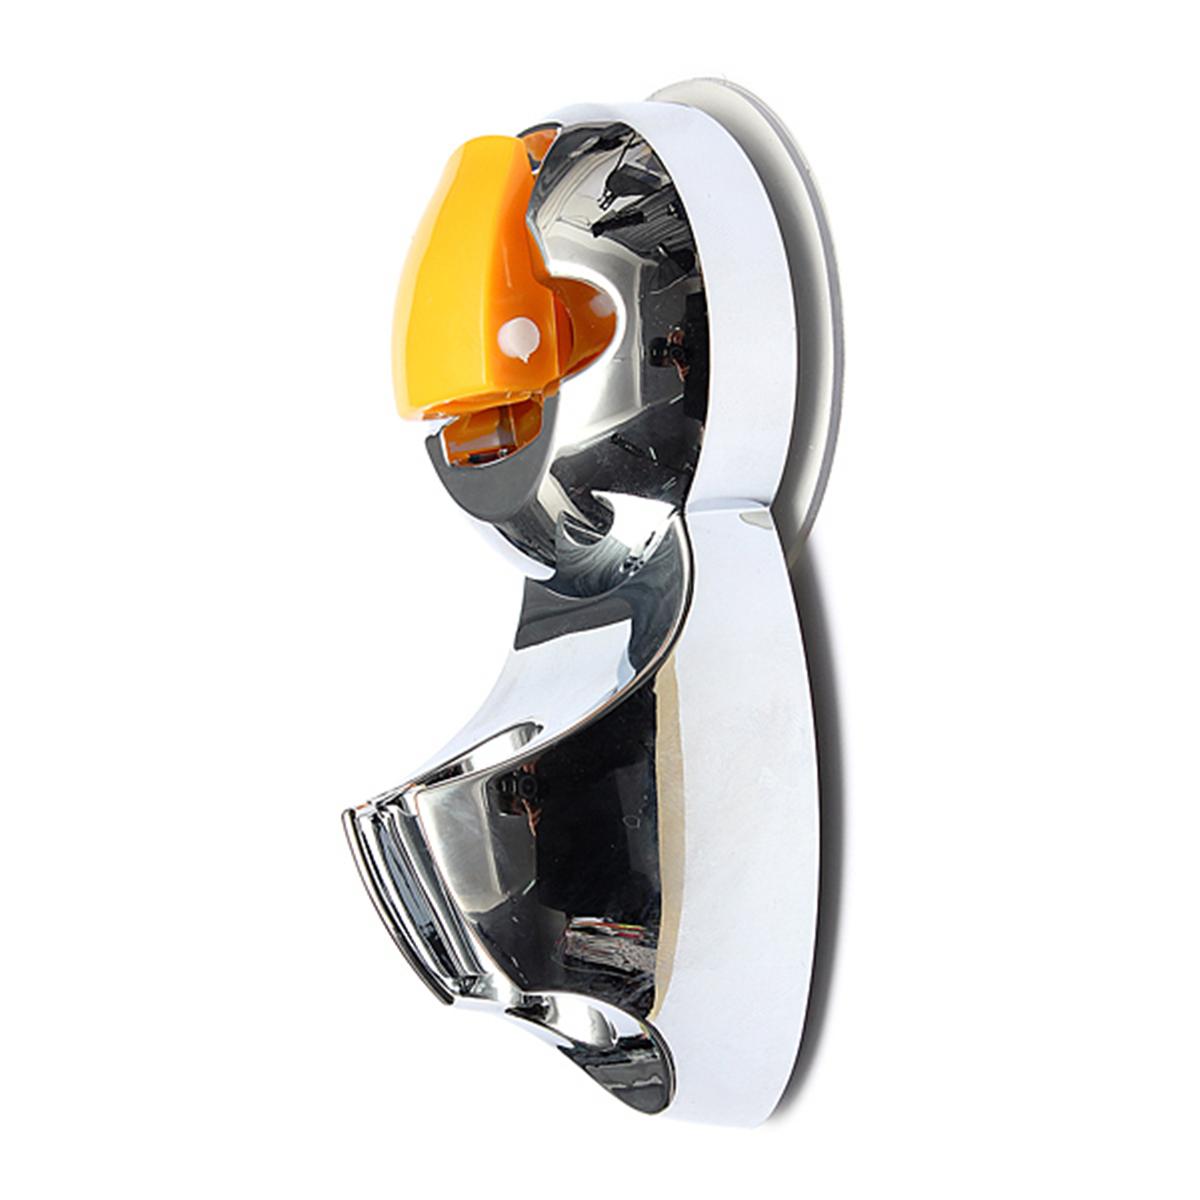 aluminium wandhalter halterung saugnapf wandhalter f r bad handbrause duschkopf ebay. Black Bedroom Furniture Sets. Home Design Ideas